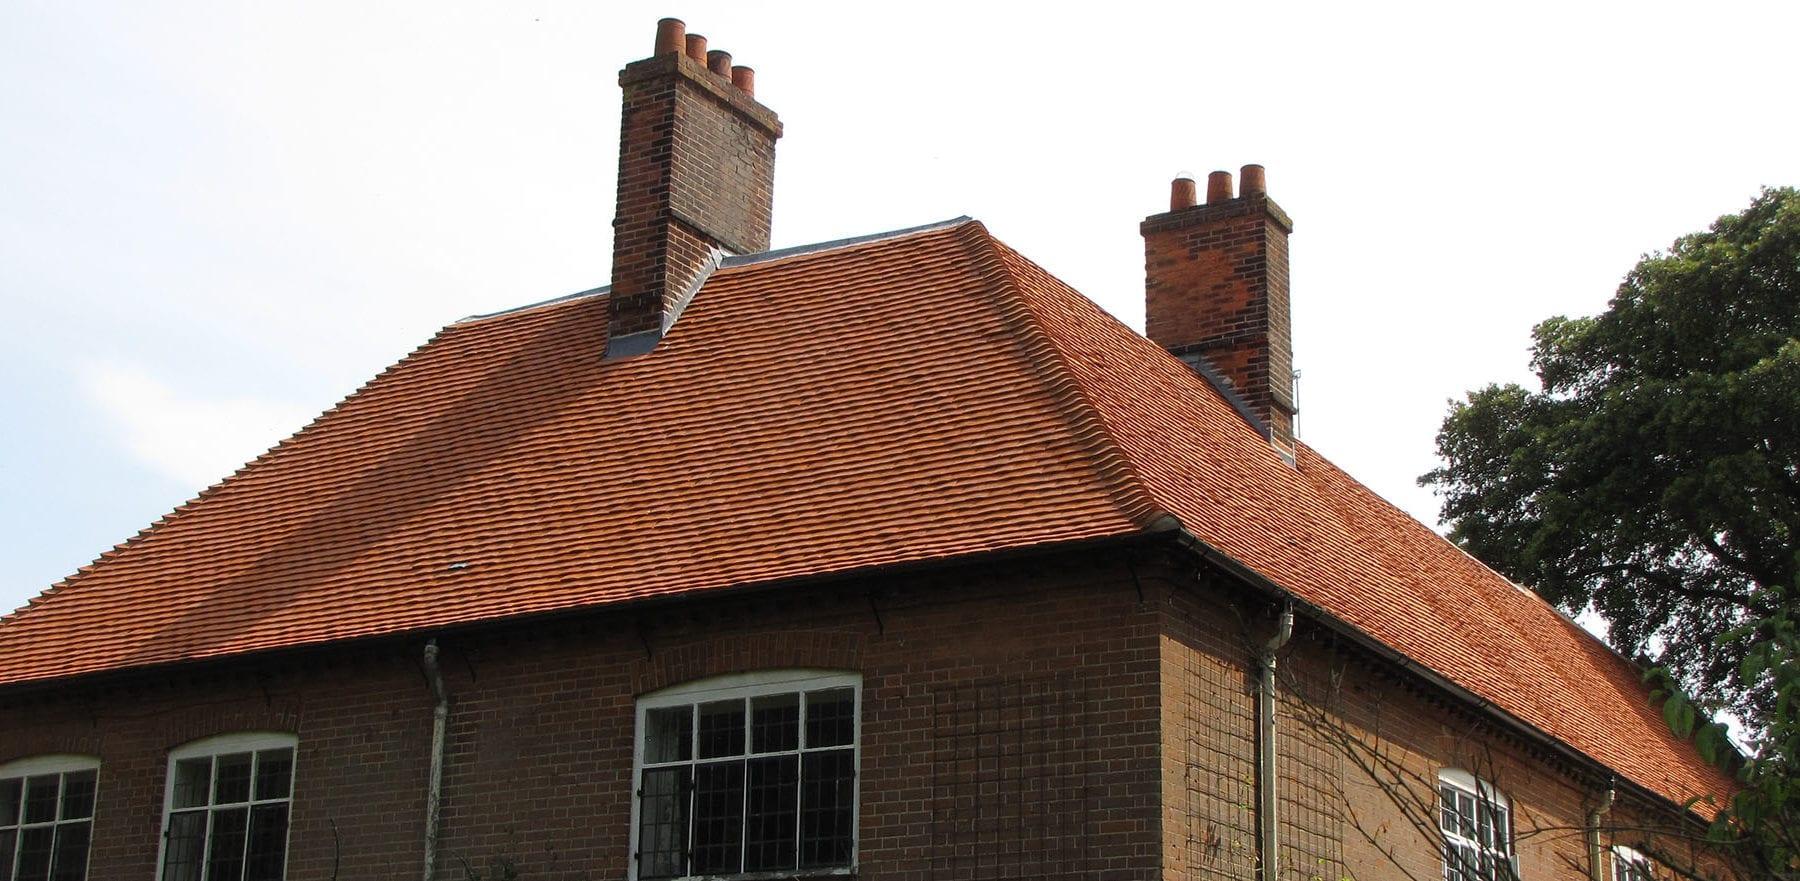 Lifestiles - Handcrafted Orange Clay Roof Tiles - Wisset Hall, England 2